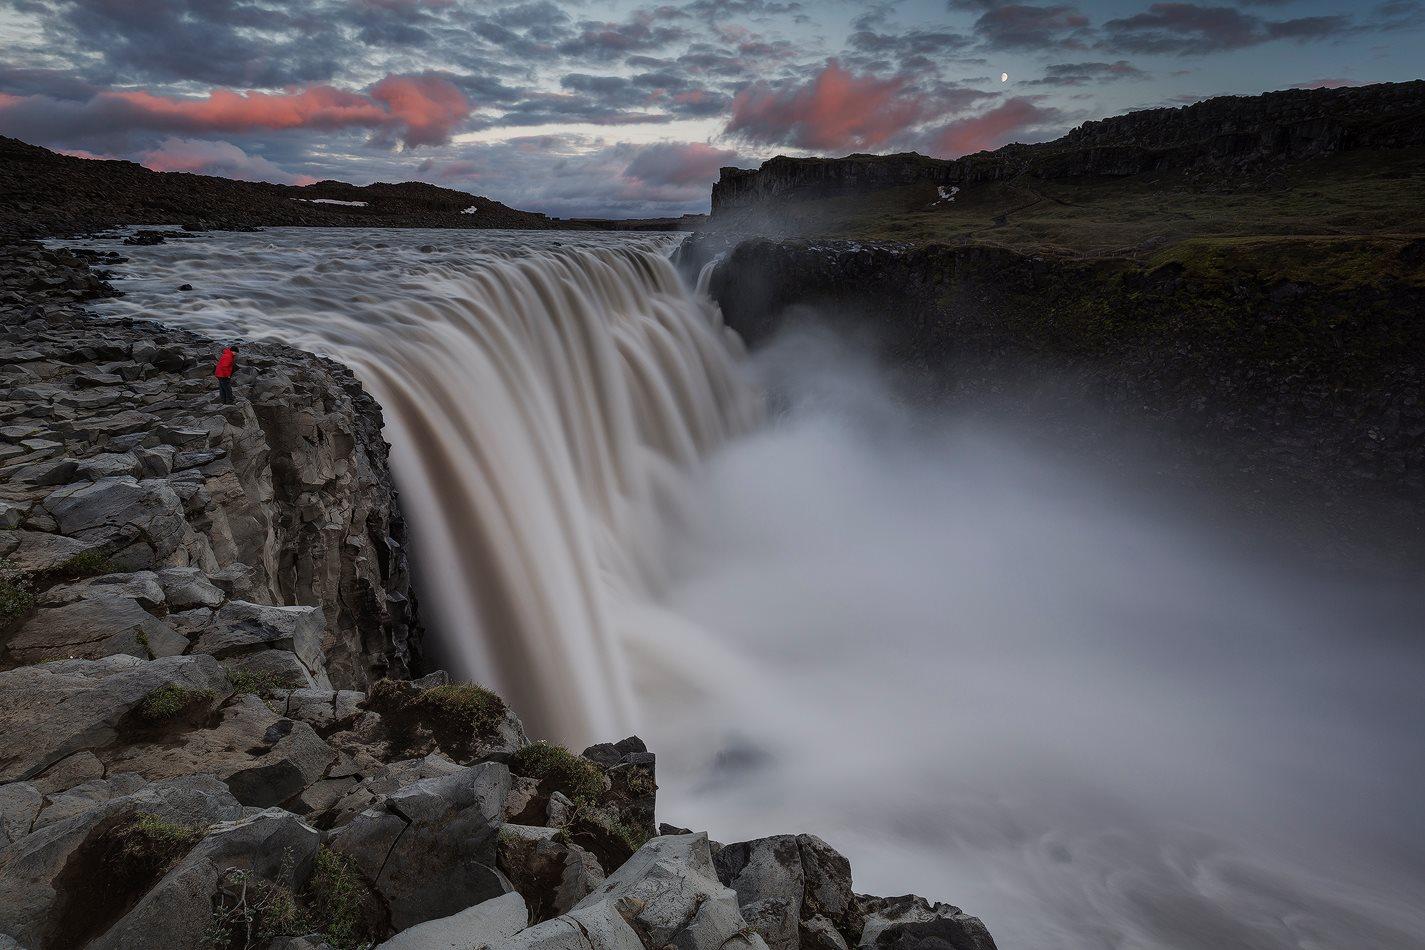 Europas stärkster Wasserfall Dettifoss stürzt mit furchterregendem Tosen in die Jökulsárgljúfur-Schlucht.